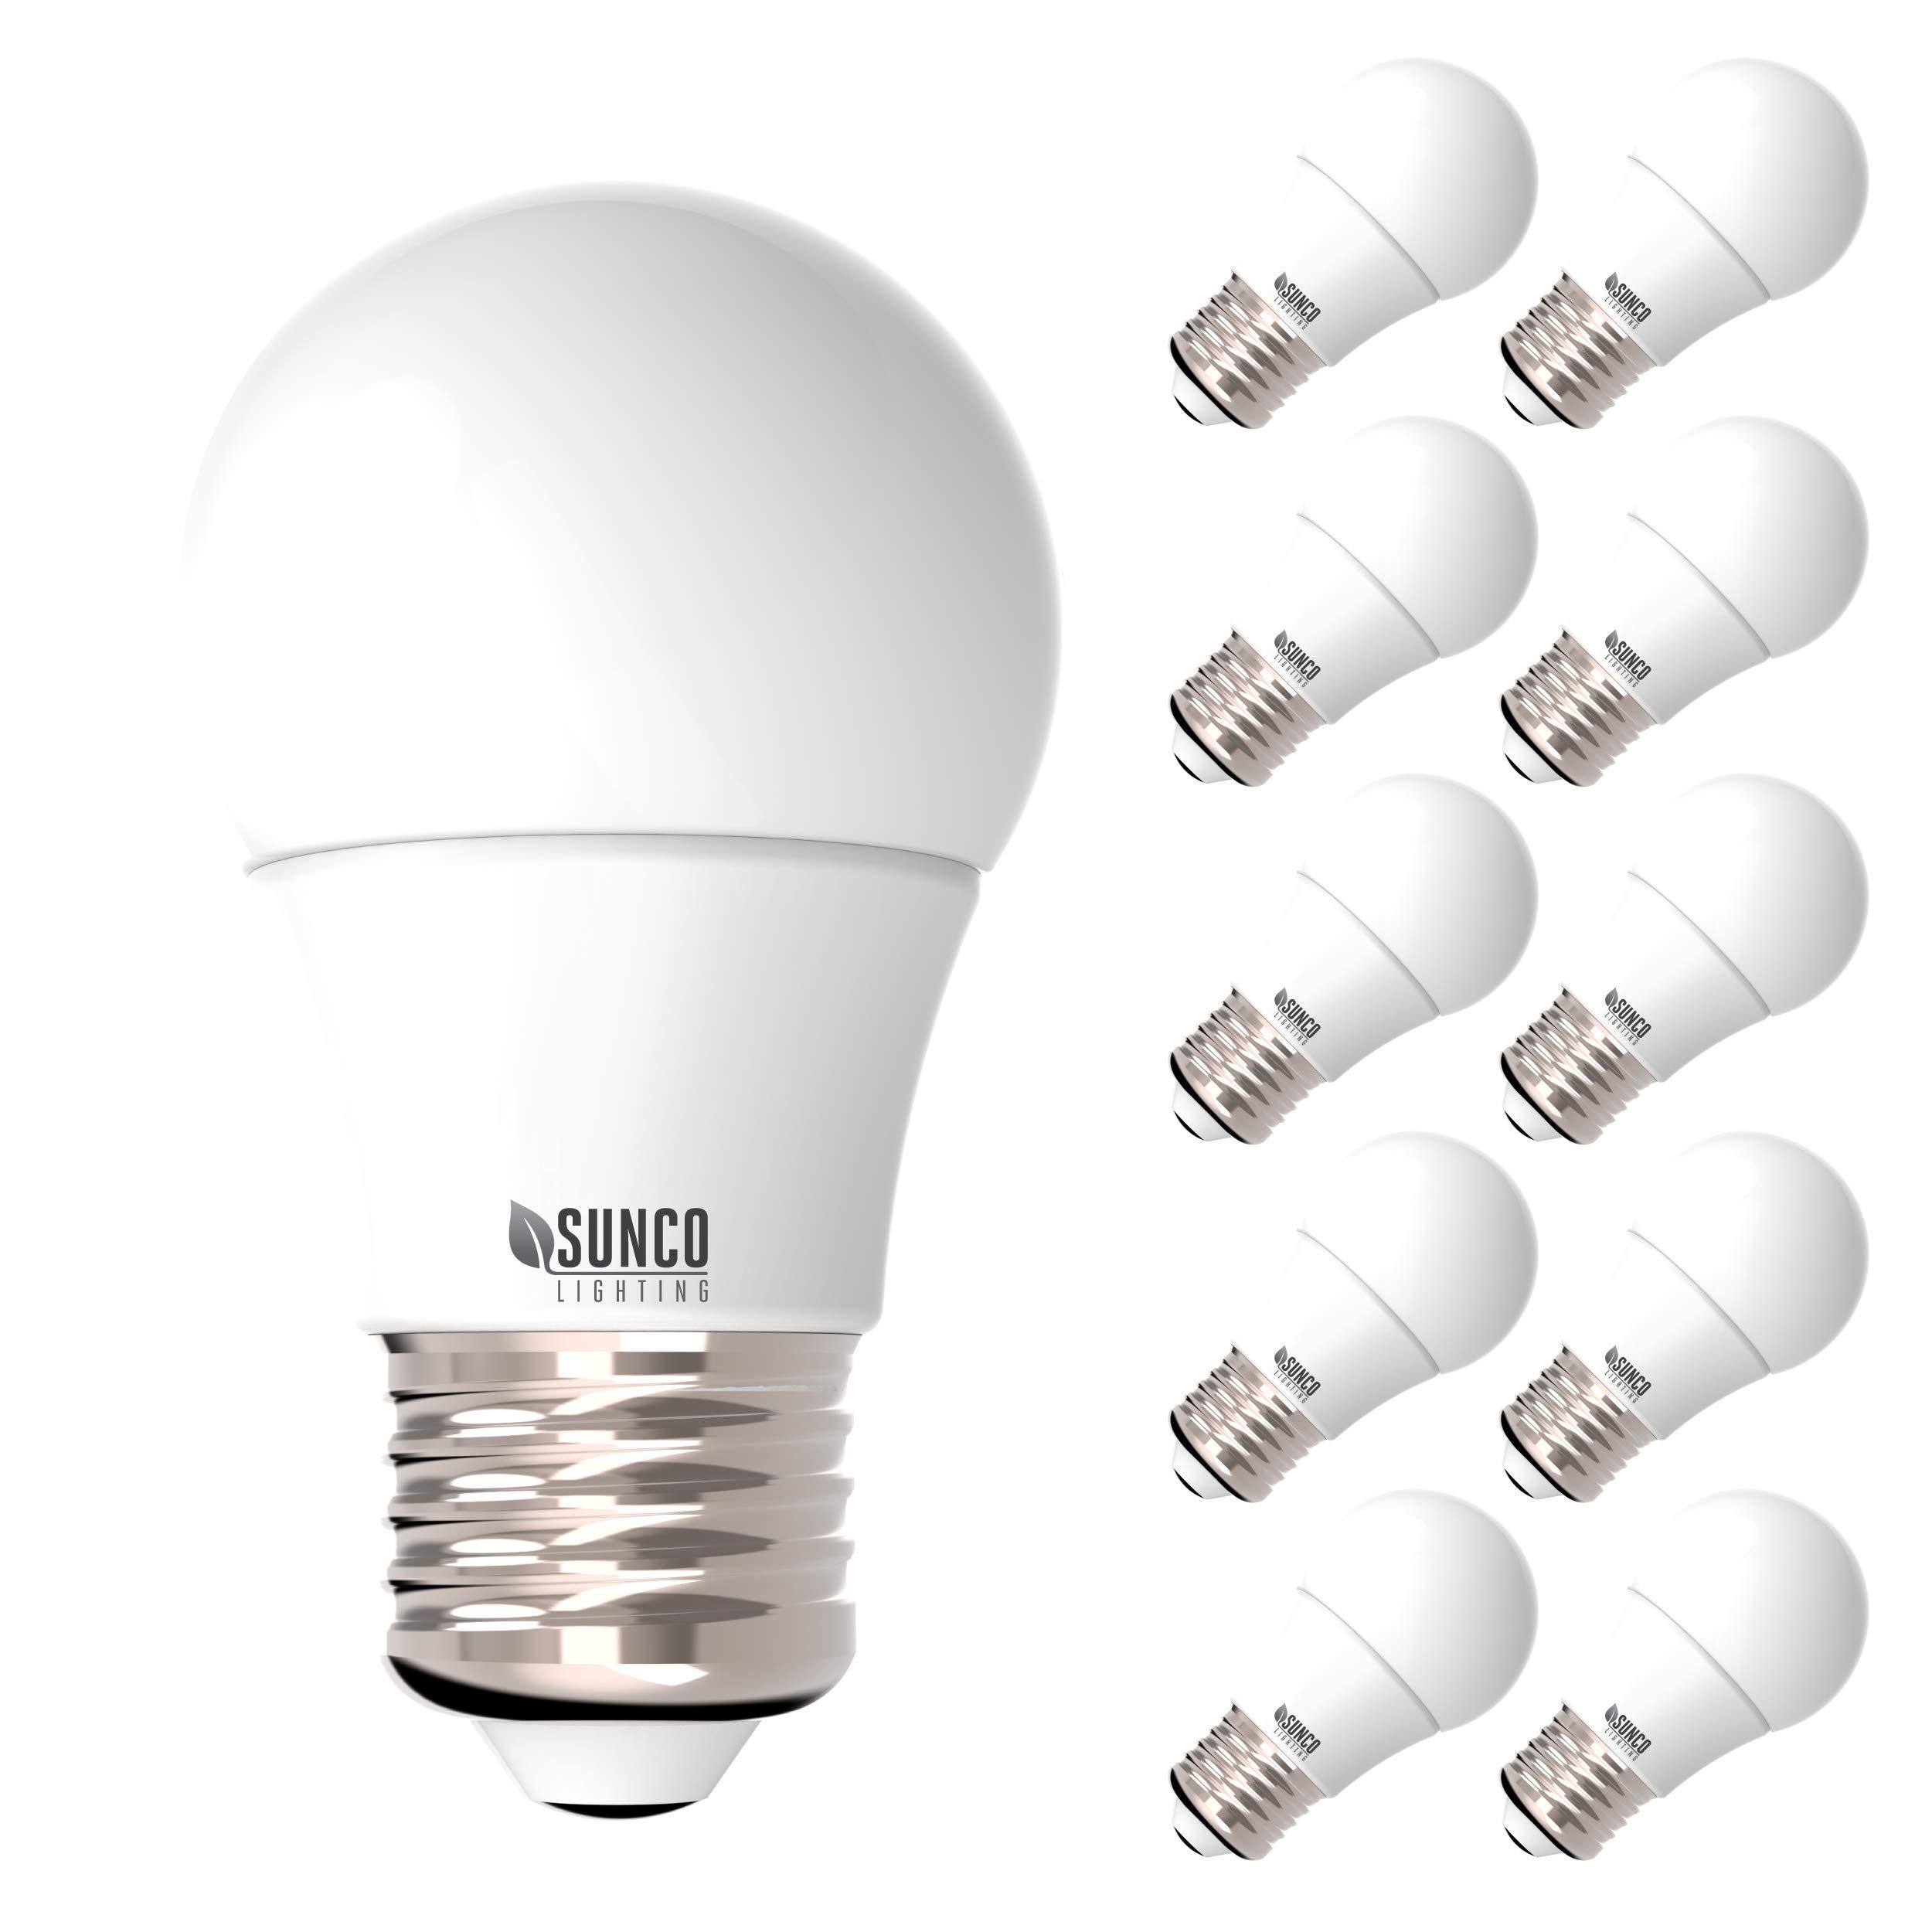 Sunco Lighting 10 Pack A15 LED Bulb, 8W=60W, 3000K Warm White, Dimmable, 800 LM, E26 Base, Refrigerator & Fan Light - UL, Energy Star